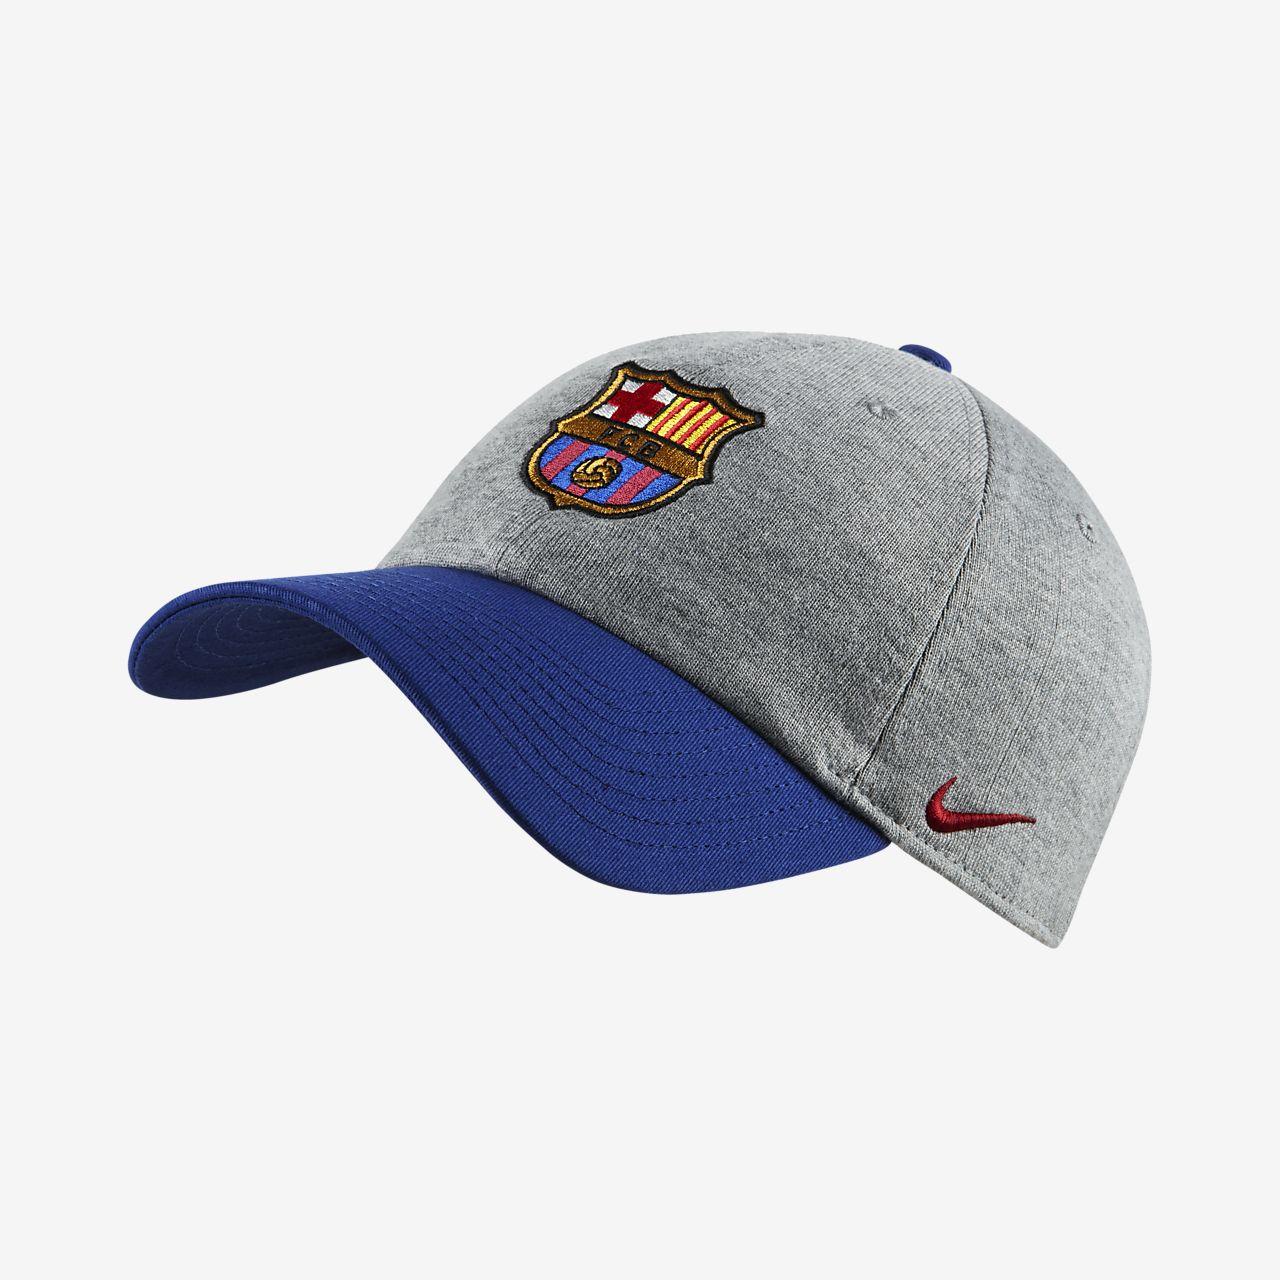 9e62559610a40 FC Barcelona H86 Adjustable Hat. Nike.com SK